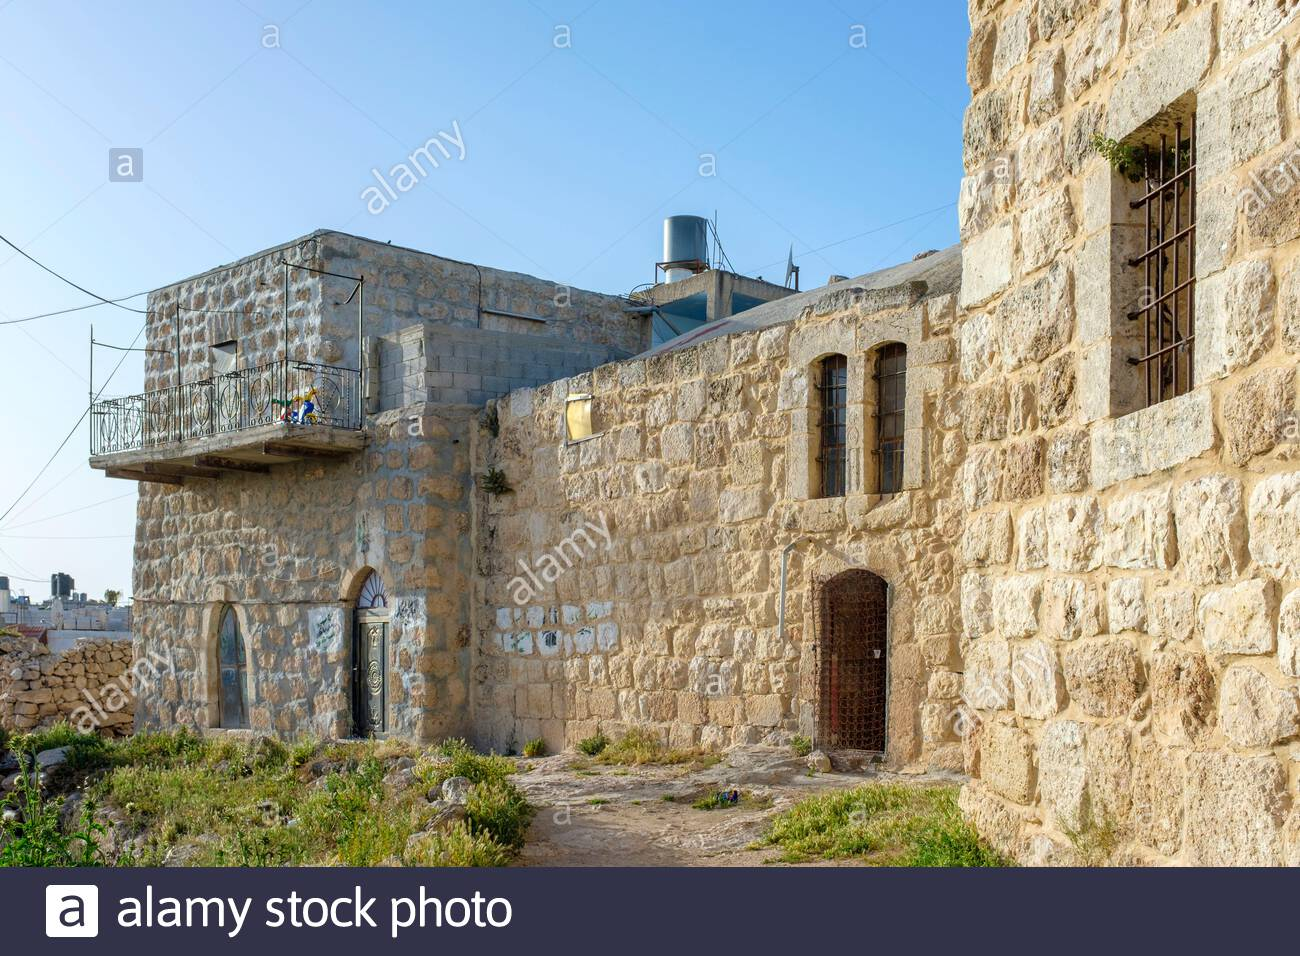 Historic buildings in ad-Dhahiriya, founded in thirteenth century by the Mamluk ruler Al-Malik al-Dhahir Baibars, Hebron Governorate, West Bank, Pales Stock Photo